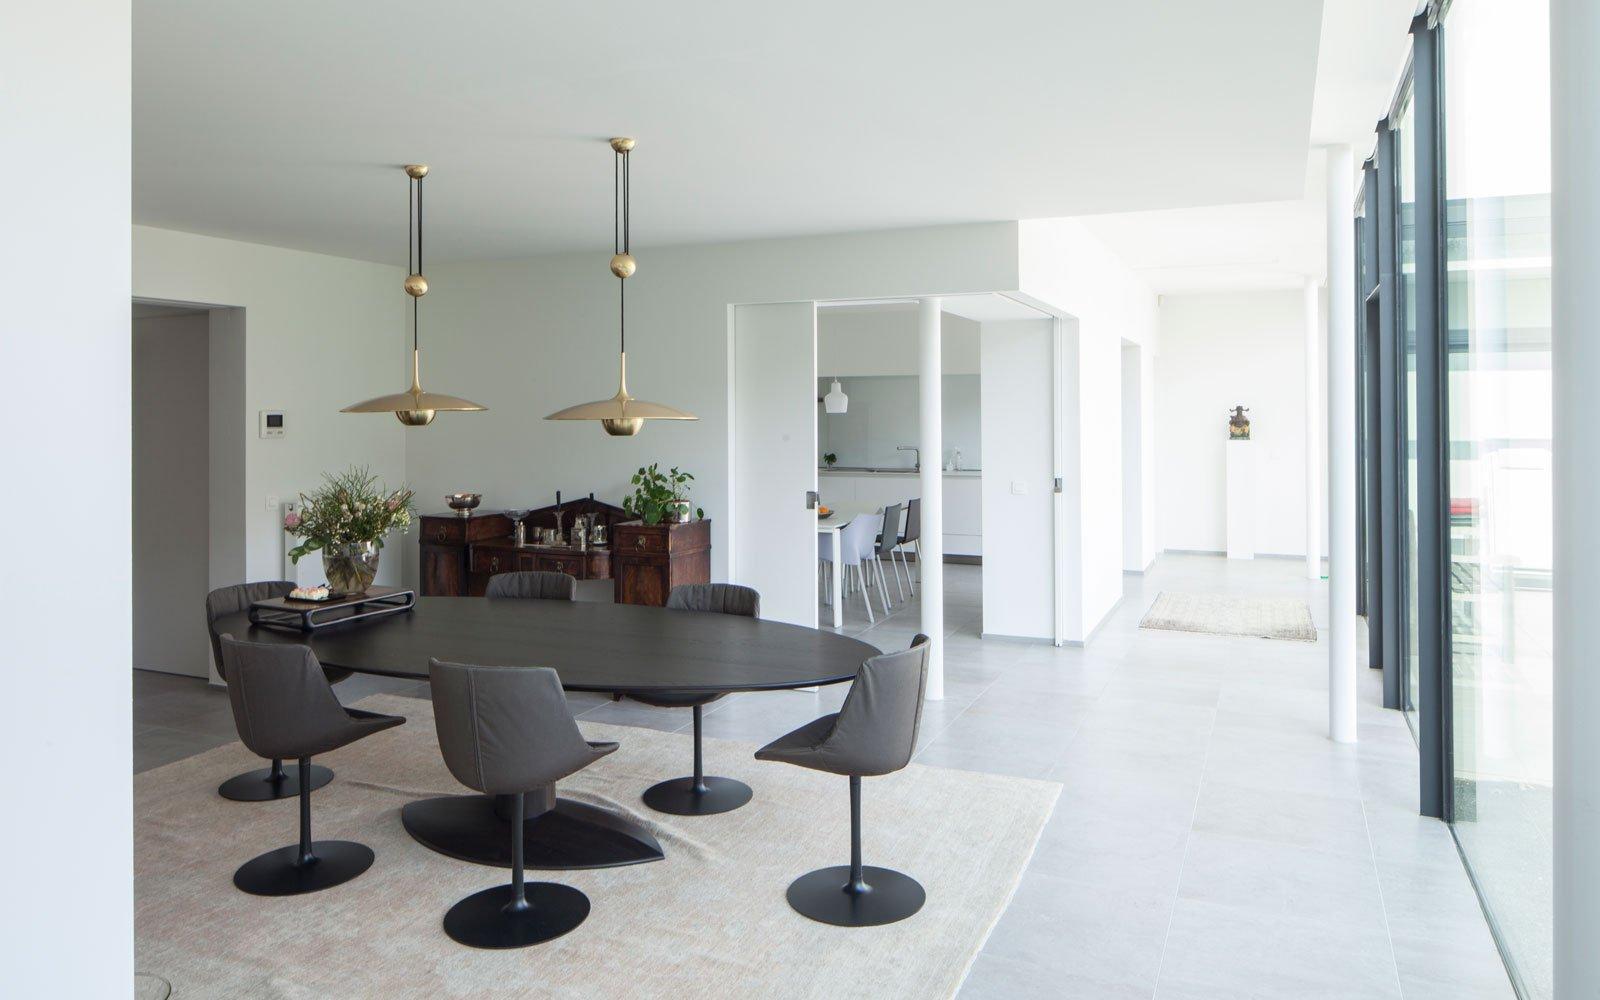 Woonkamer, ovalen tafel, Meynen Interieurarchitectuur, renovatie, p.ed architecten